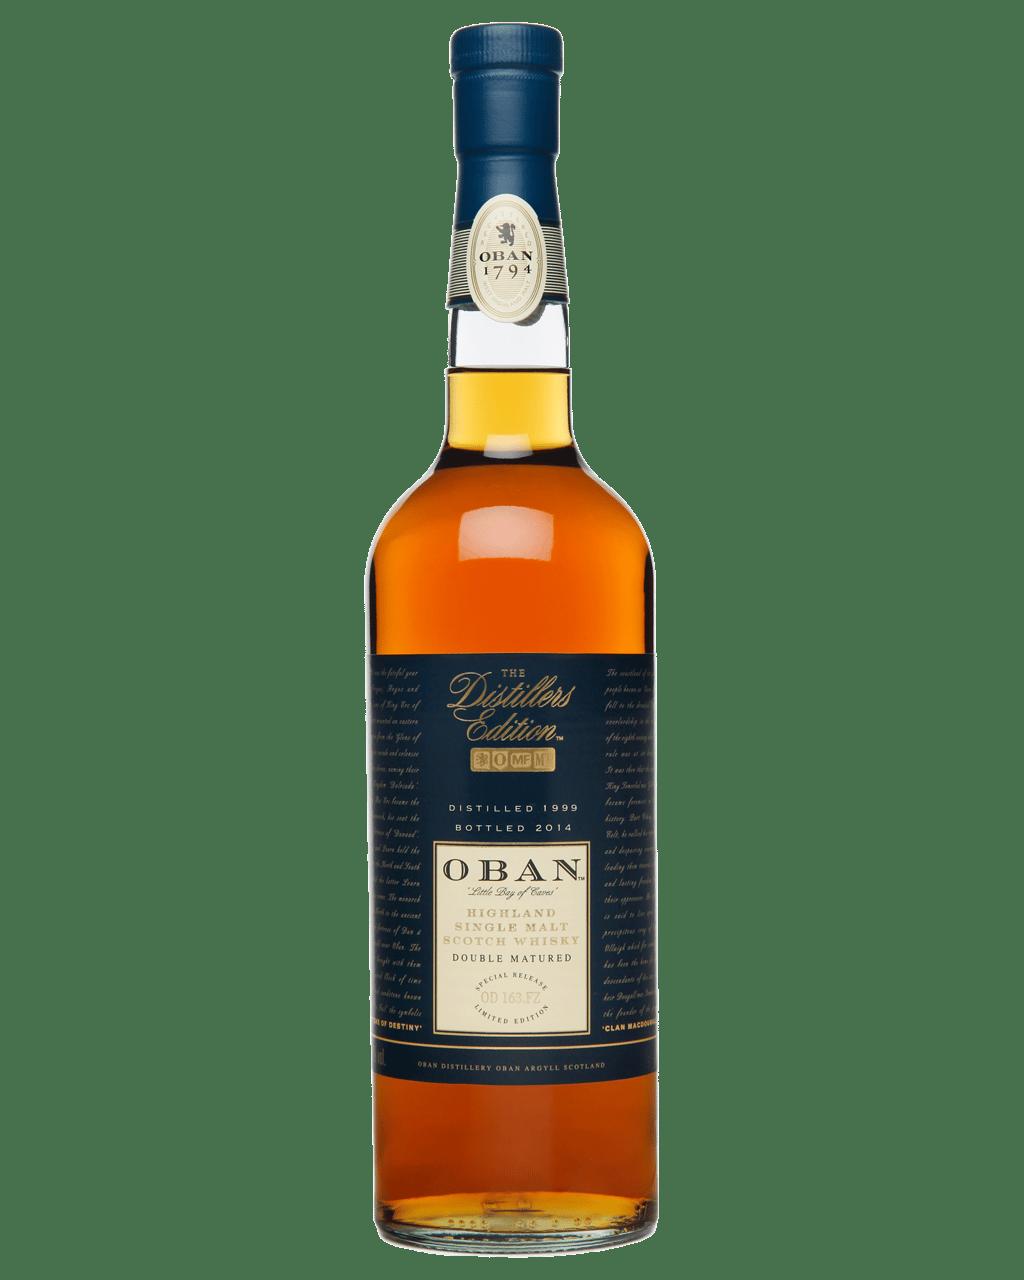 8226497b69 Oban Distillers Edition Scotch Whisky 700mL | Dan Murphy's | Buy ...